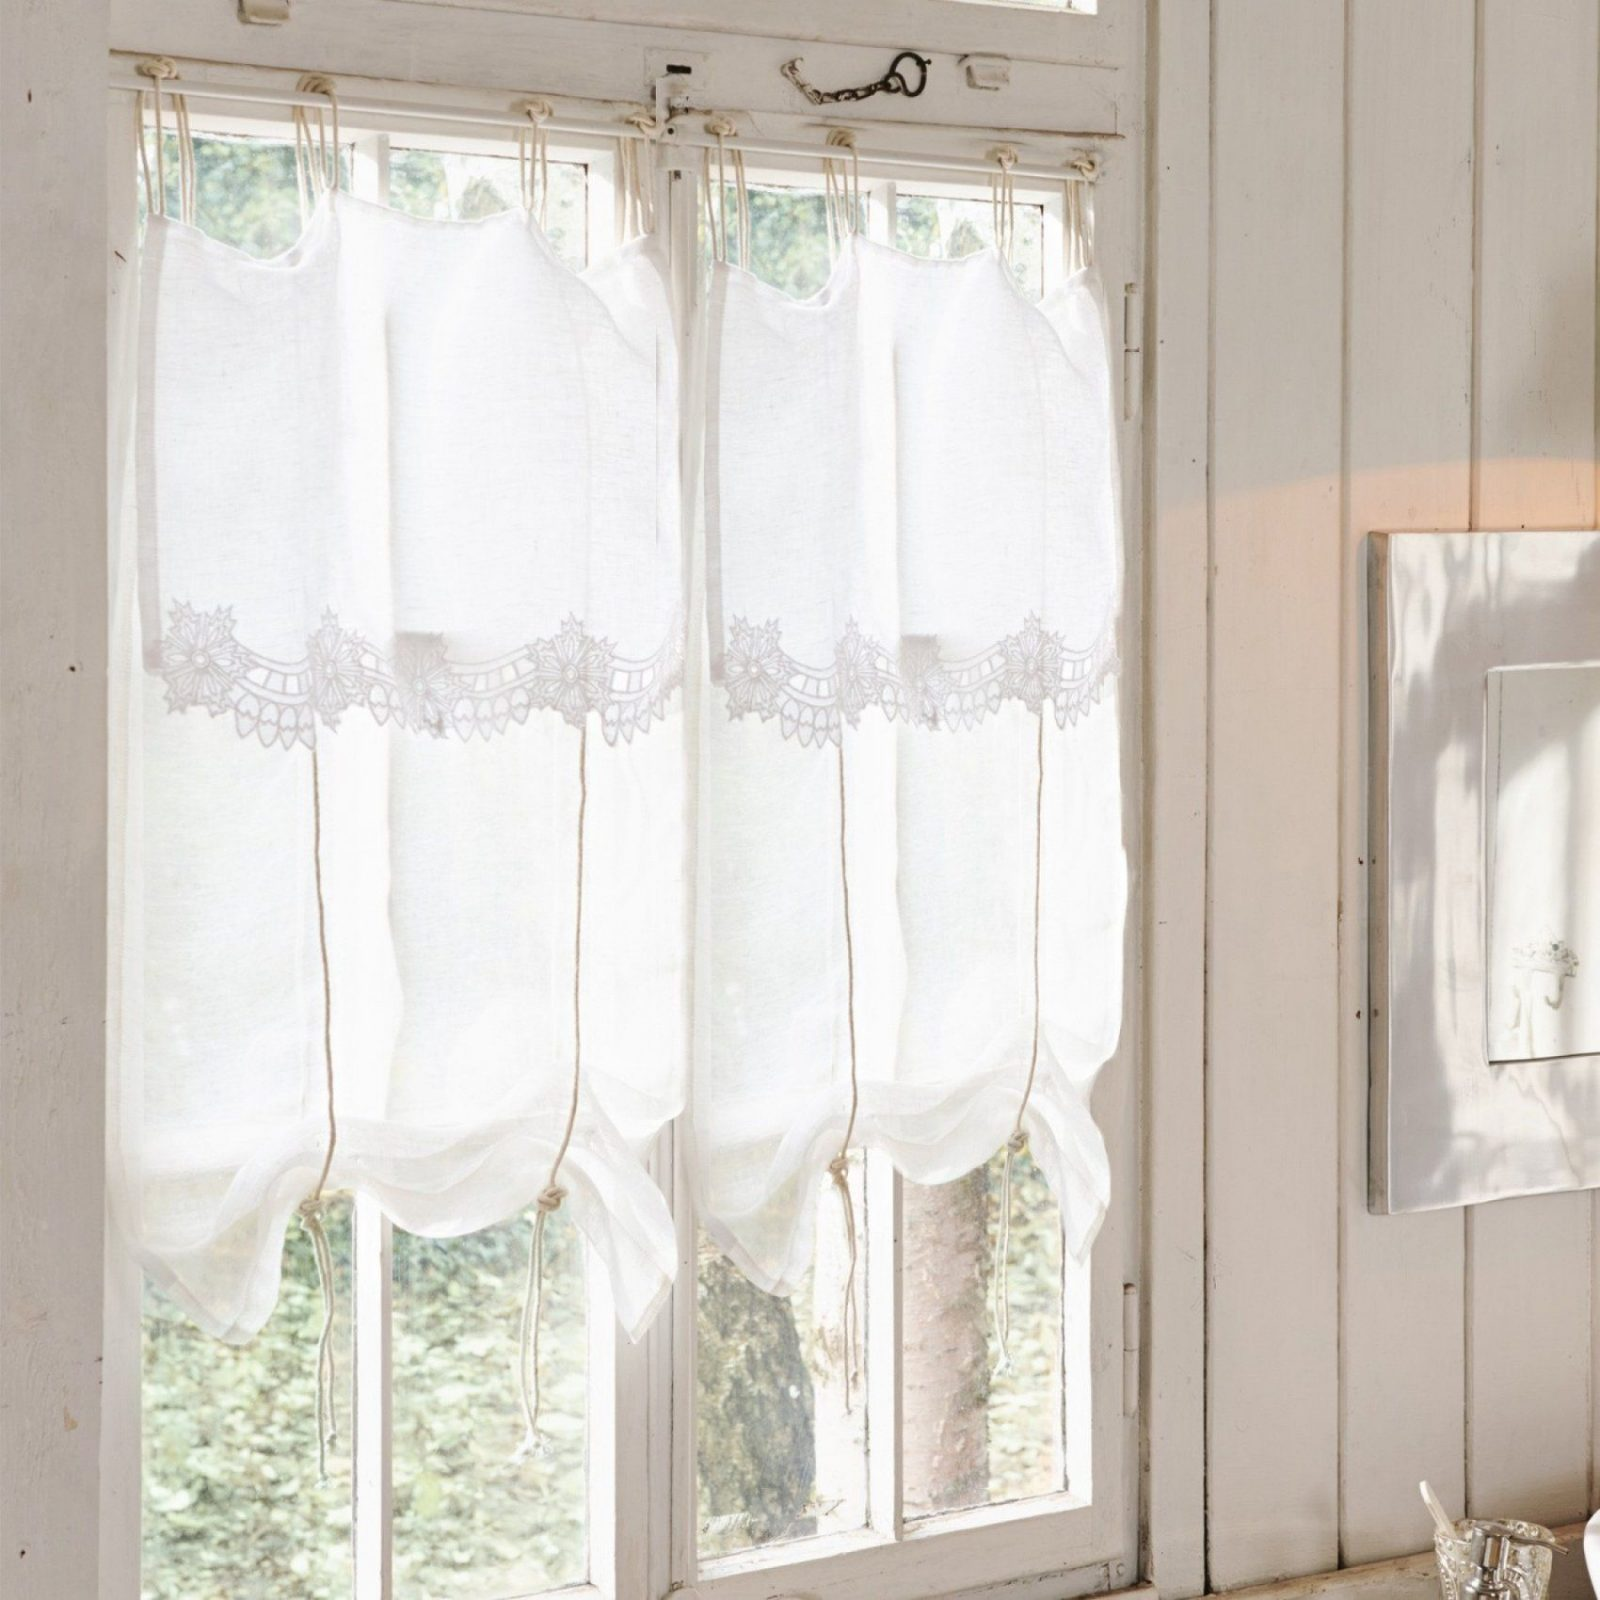 gardinen anmutig otto versand gardinen fesselnd otto versand von otto versand gardinen rollos. Black Bedroom Furniture Sets. Home Design Ideas